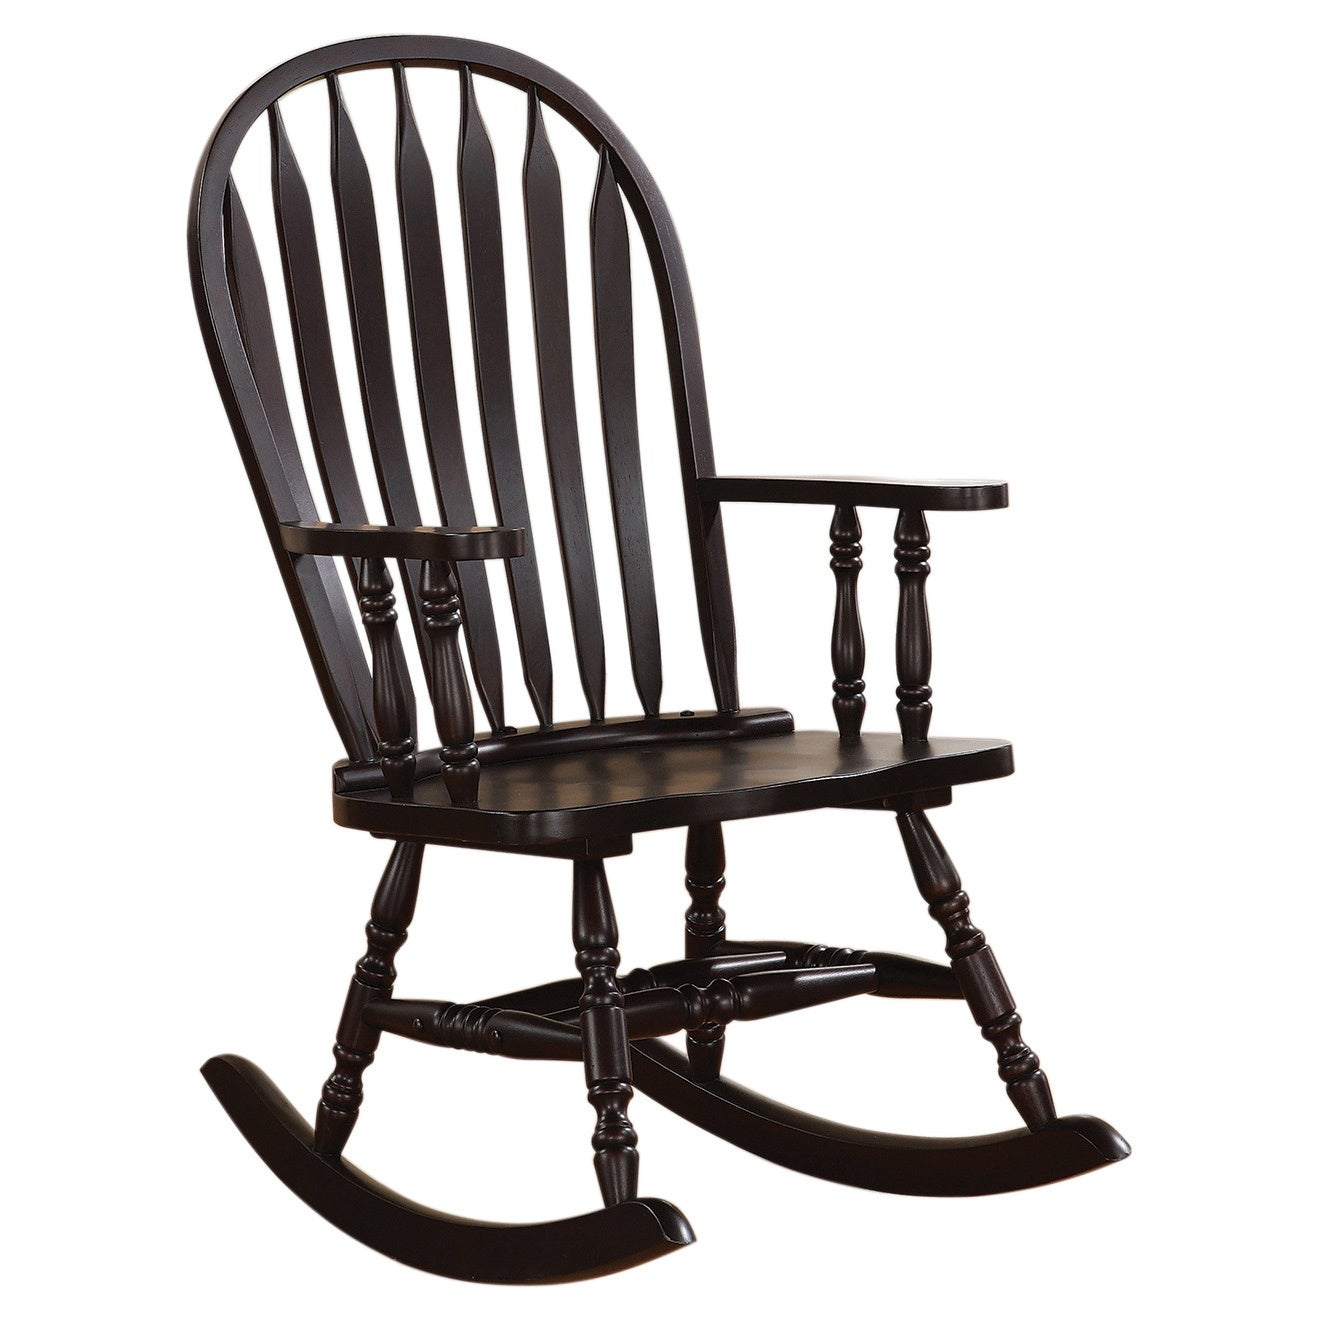 Copper Grove Pittock Cappuccino Curved Rocking Chair With Regard To Cappuccino Curved Rocking Chairs (#7 of 20)